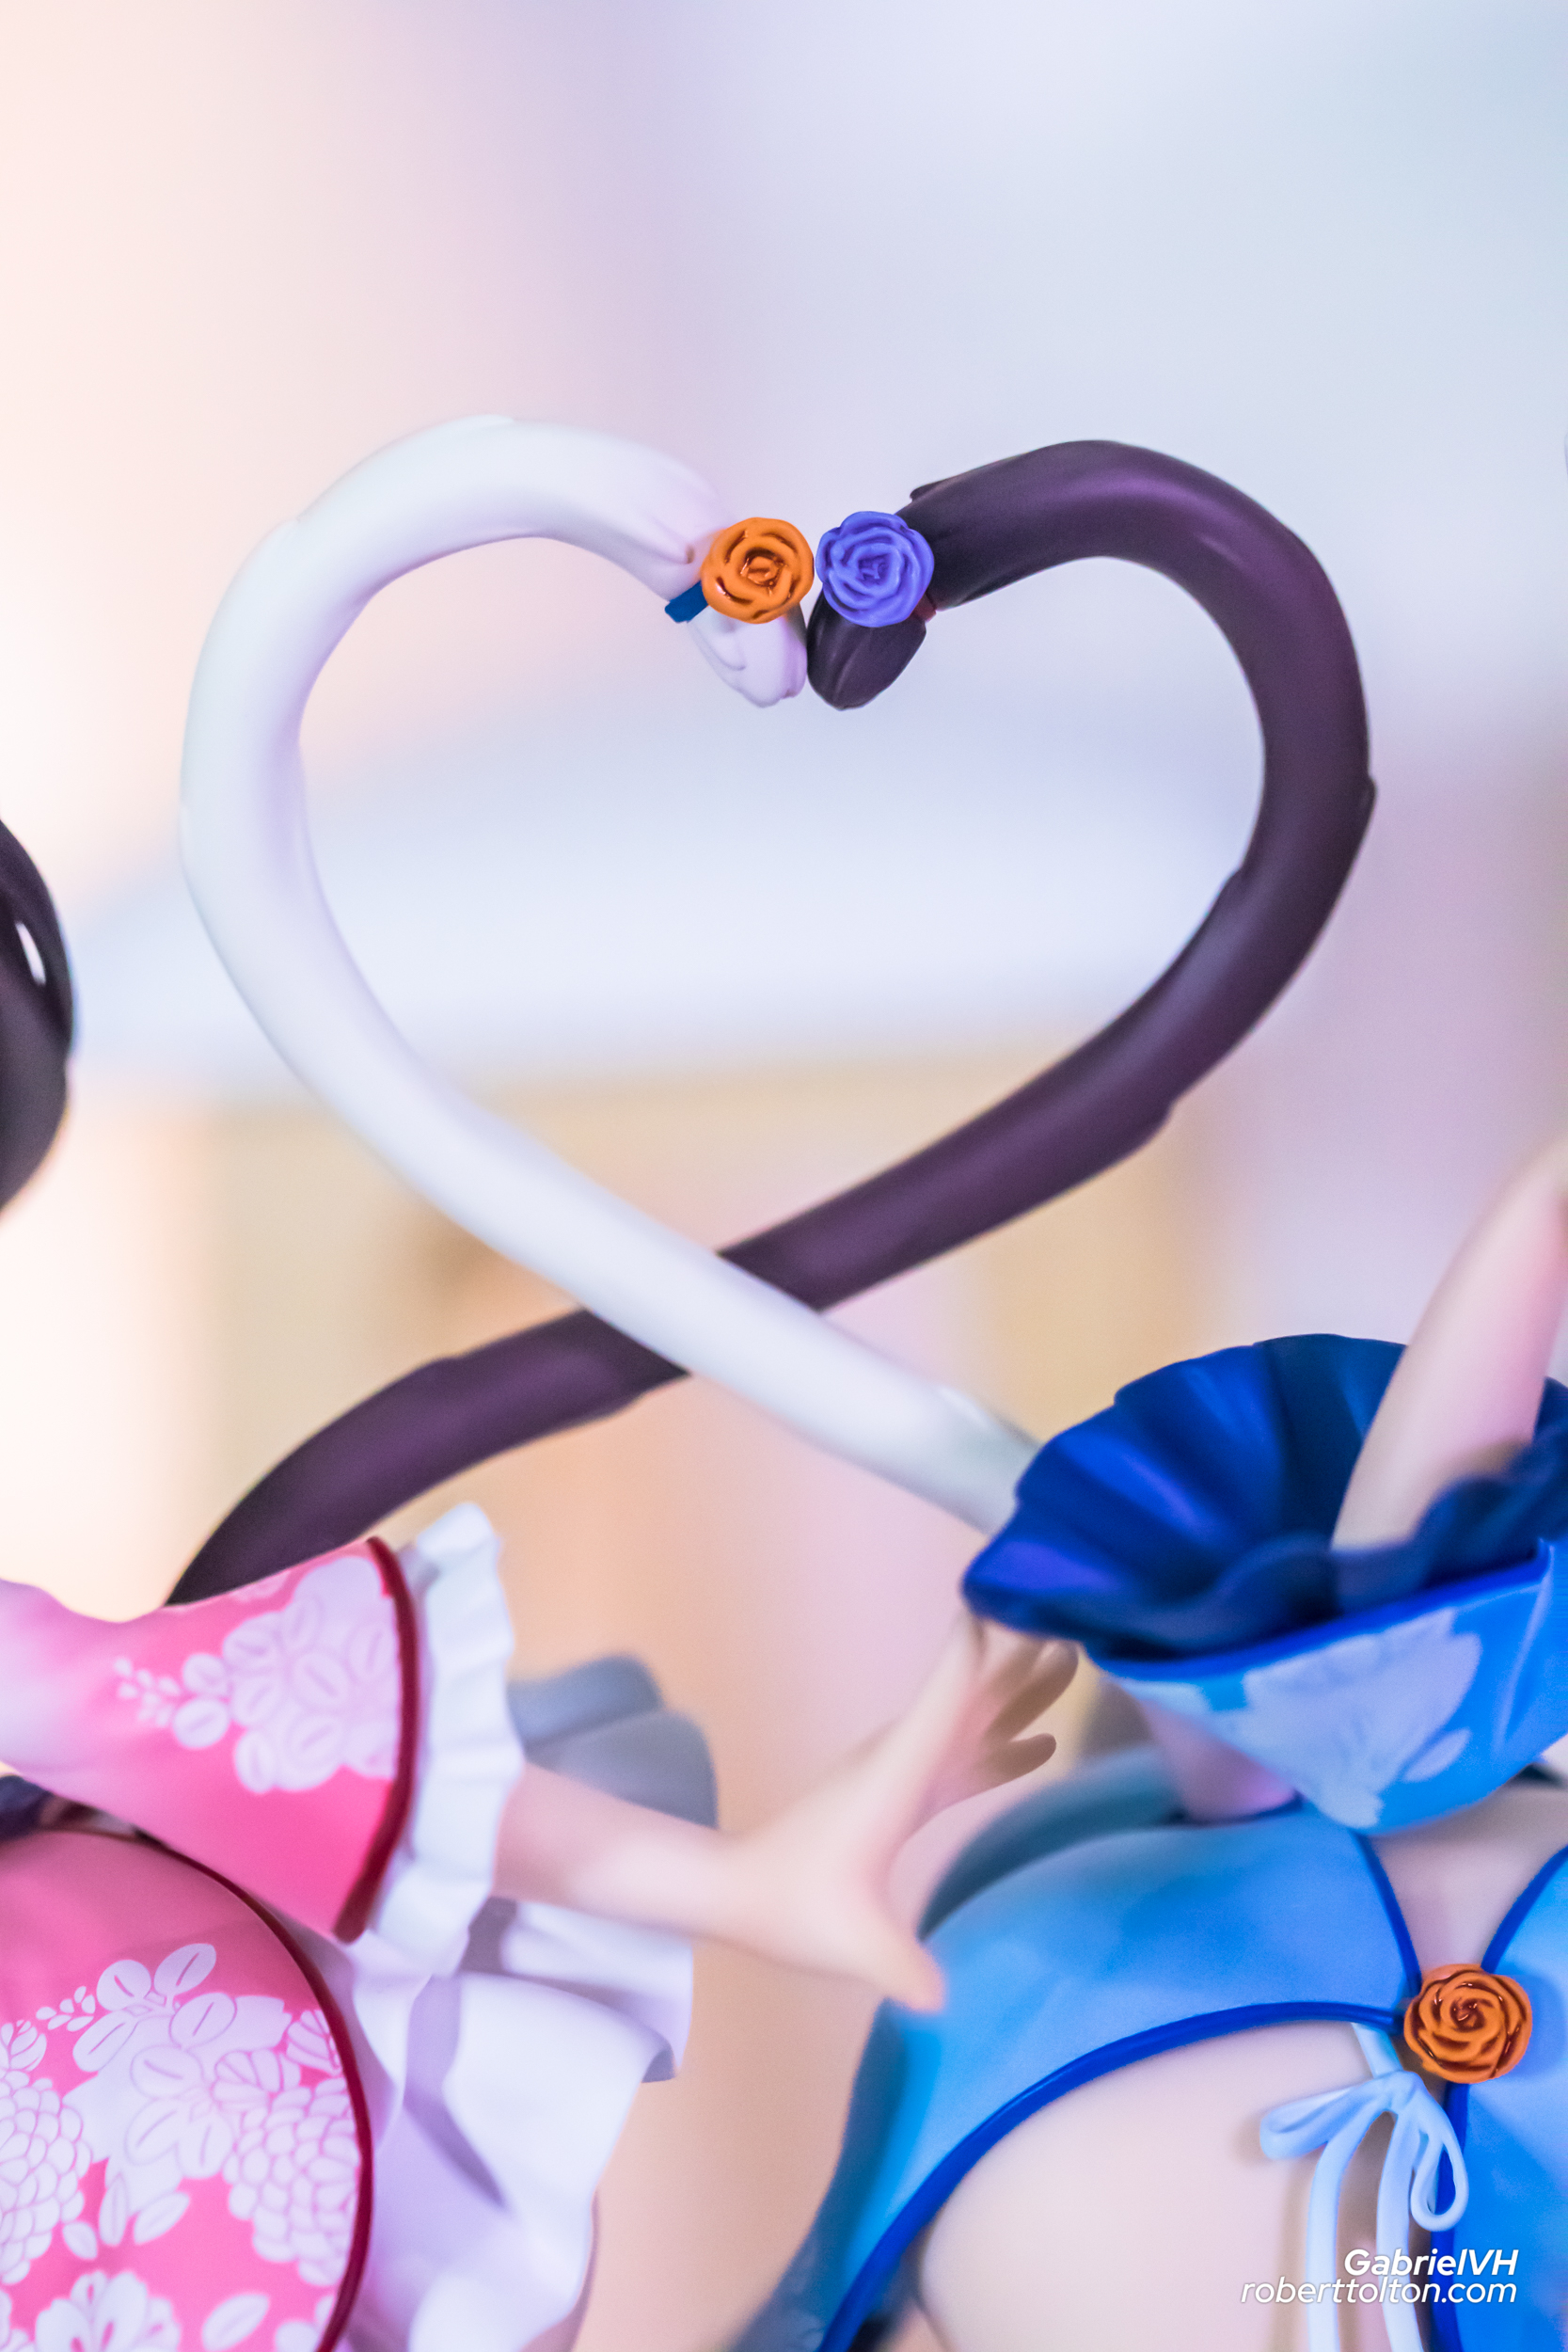 Nekopara Vanilla Chocola Chinese Dress edition illustration by Sayori DX Ver 11